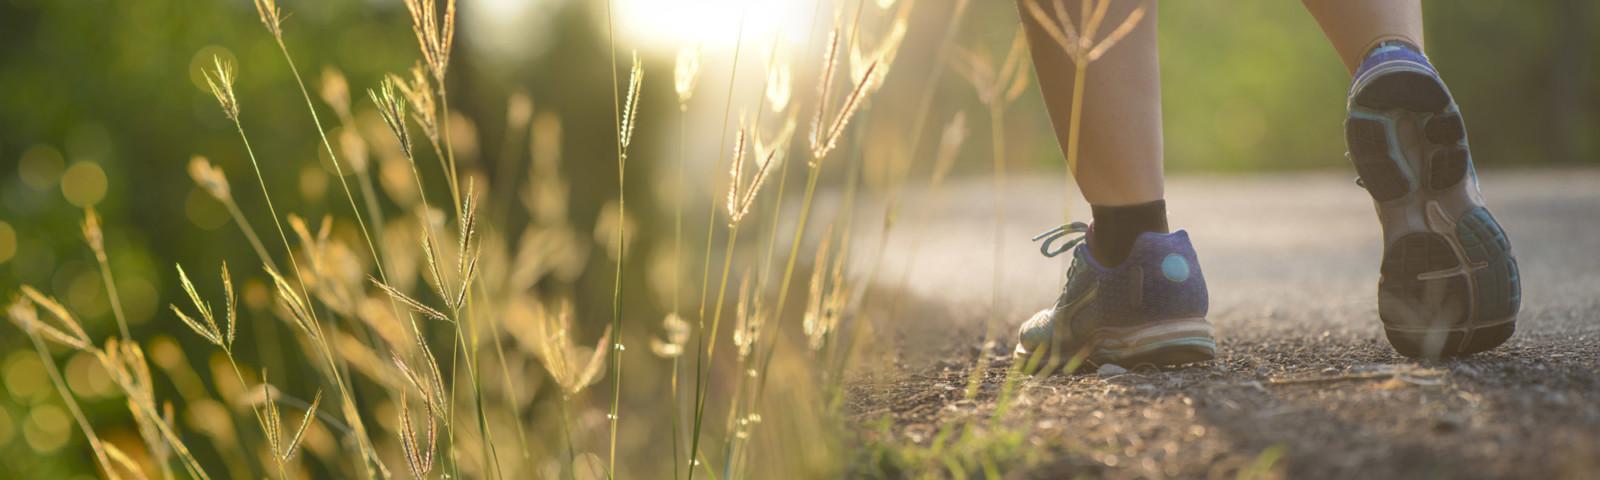 Shutterstock 601590215